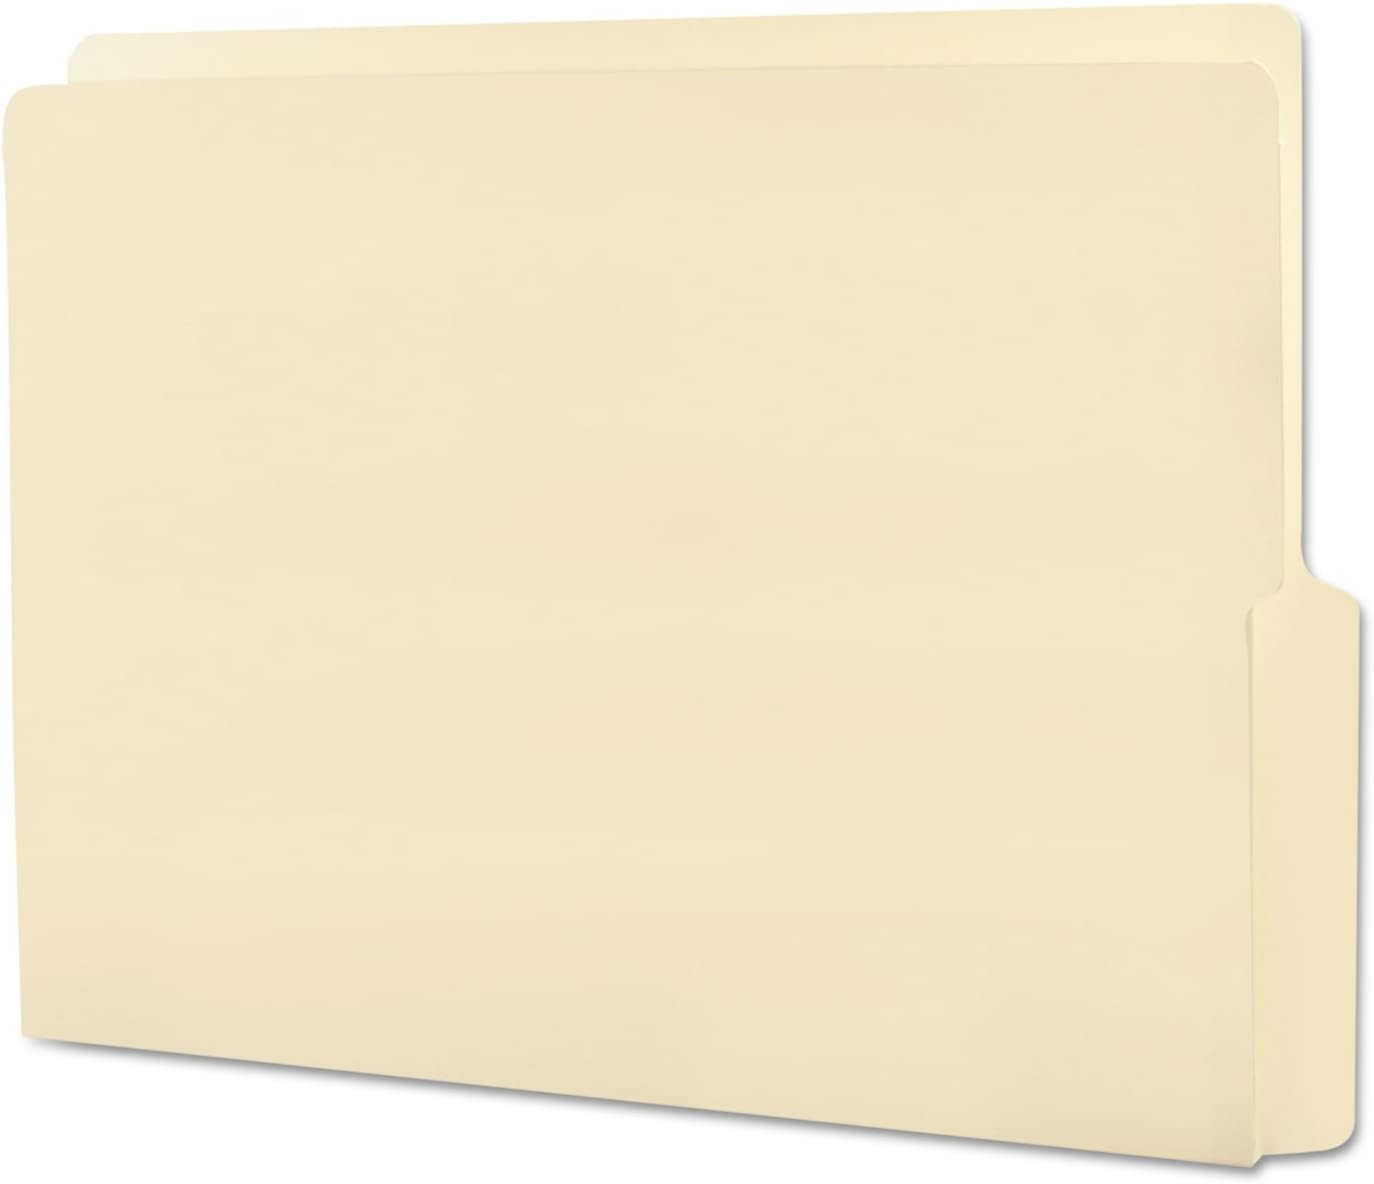 SMD24128 Smead 24128 Manila End Tab File Folders with Reinforced Tab